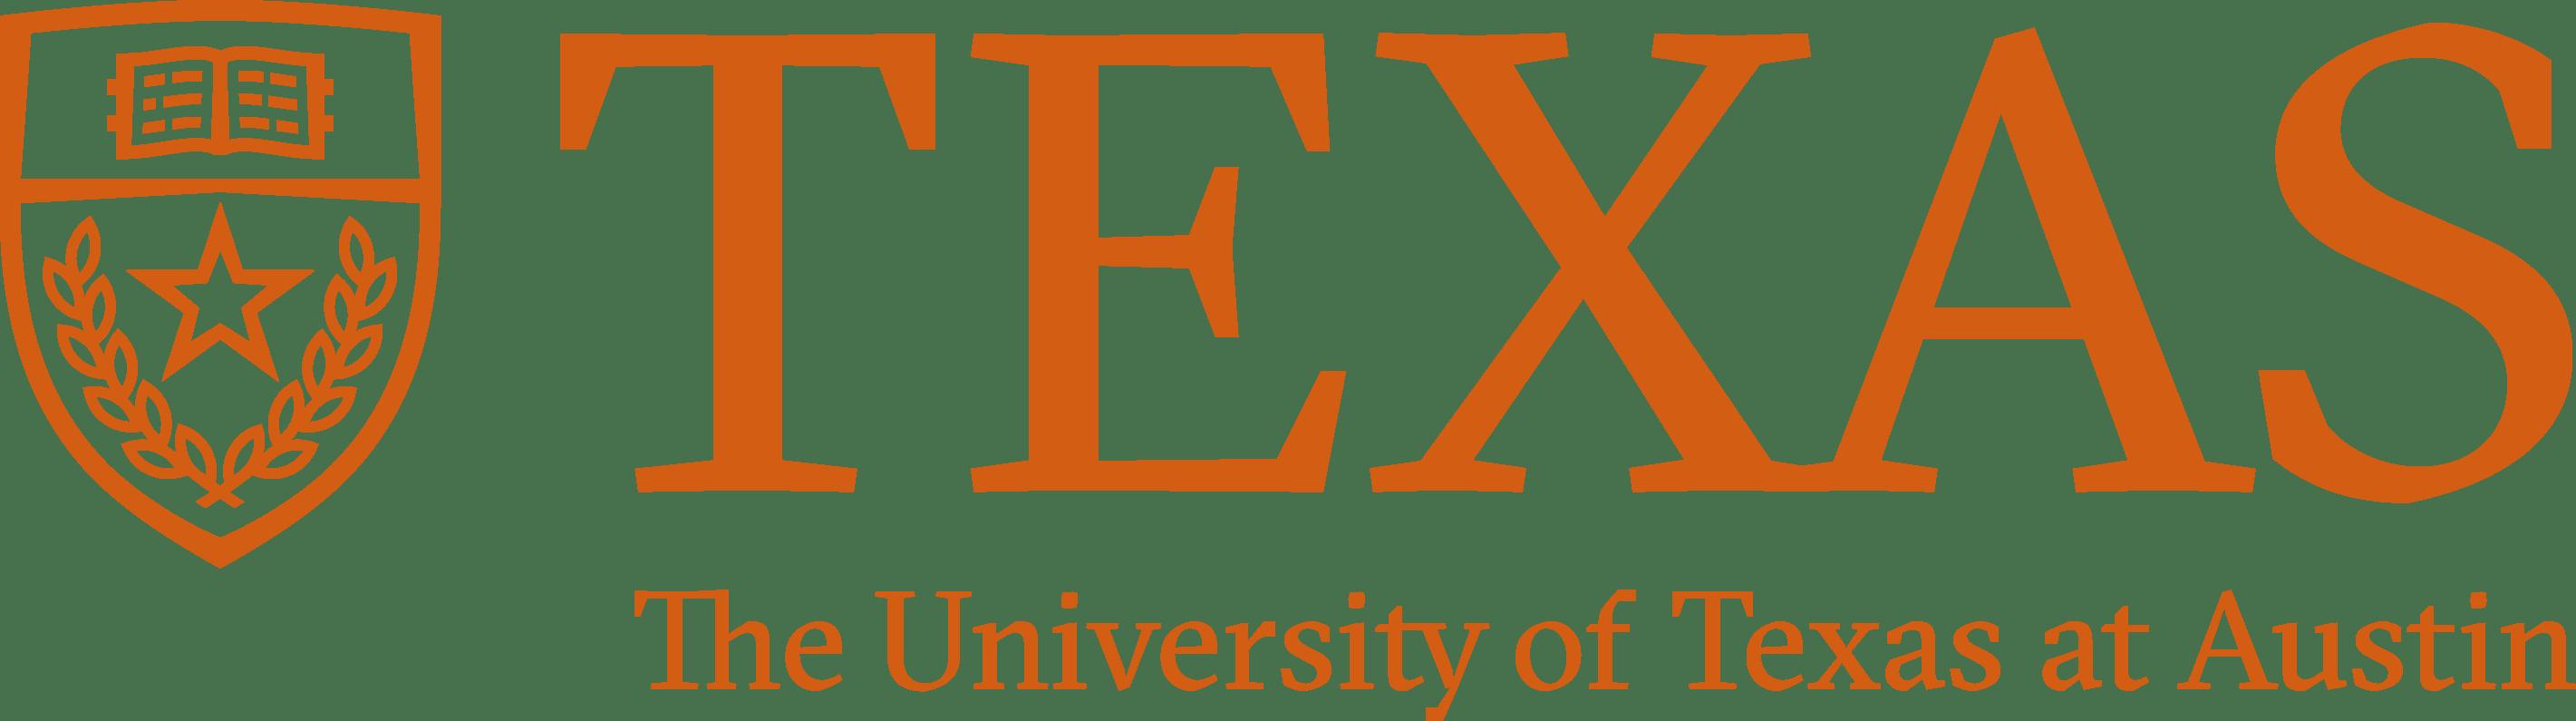 the-university-of-texas-at-austin-logo